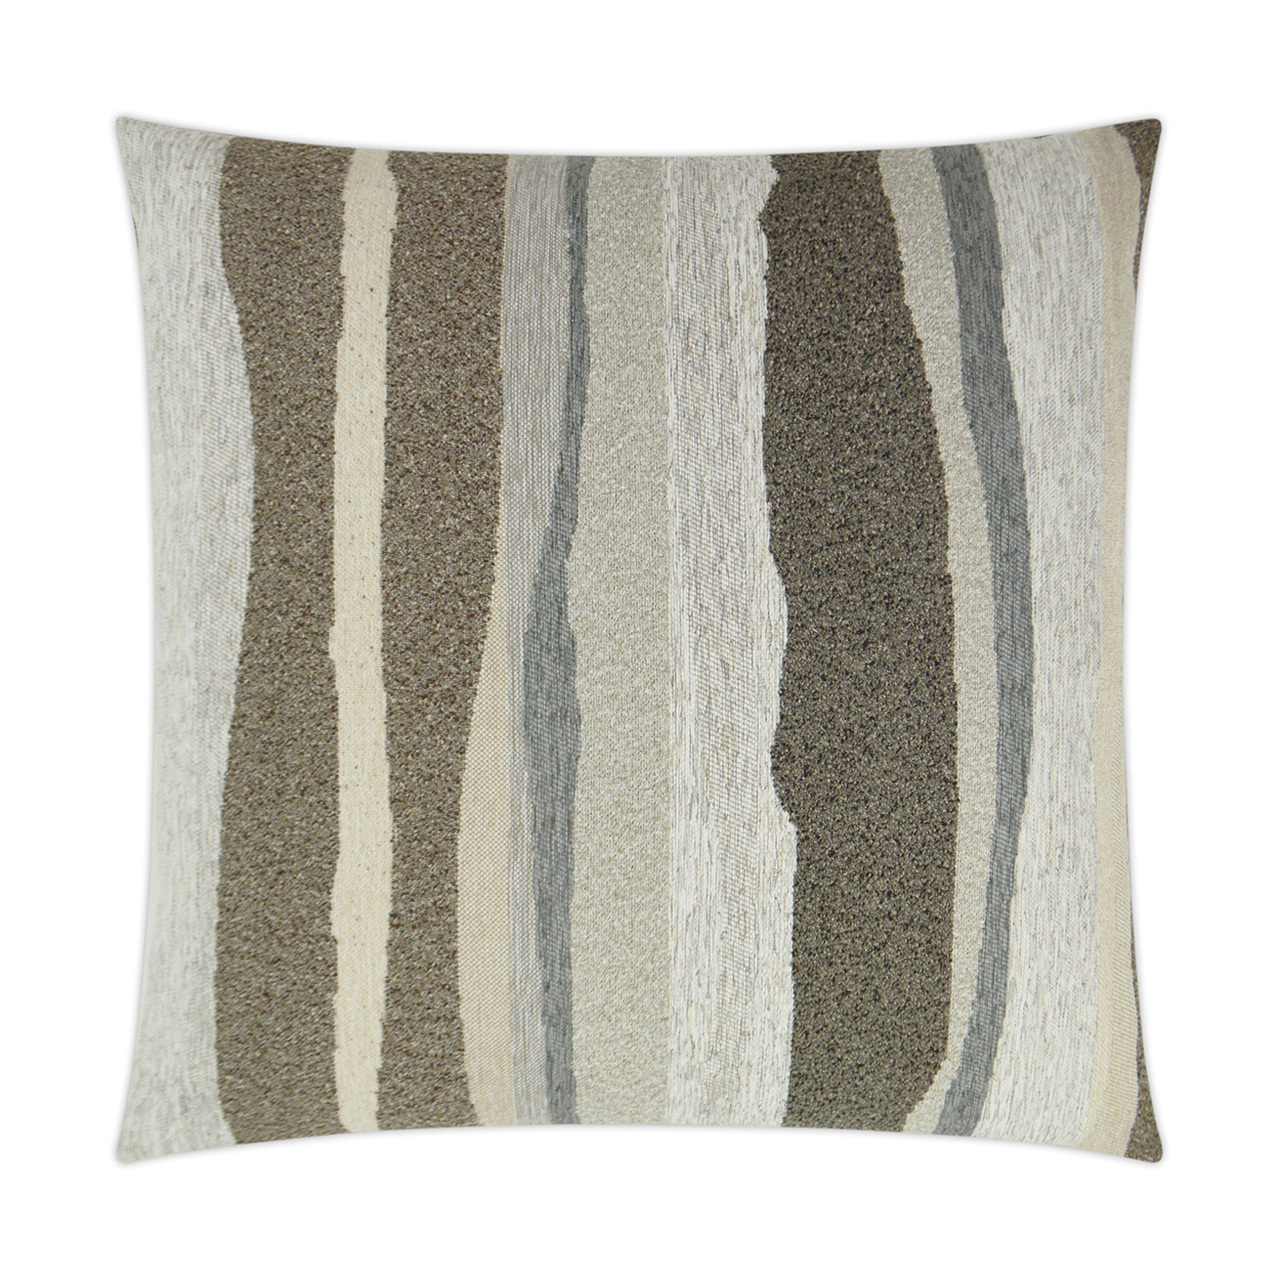 Mineral Horizon Organic Throw Pillow